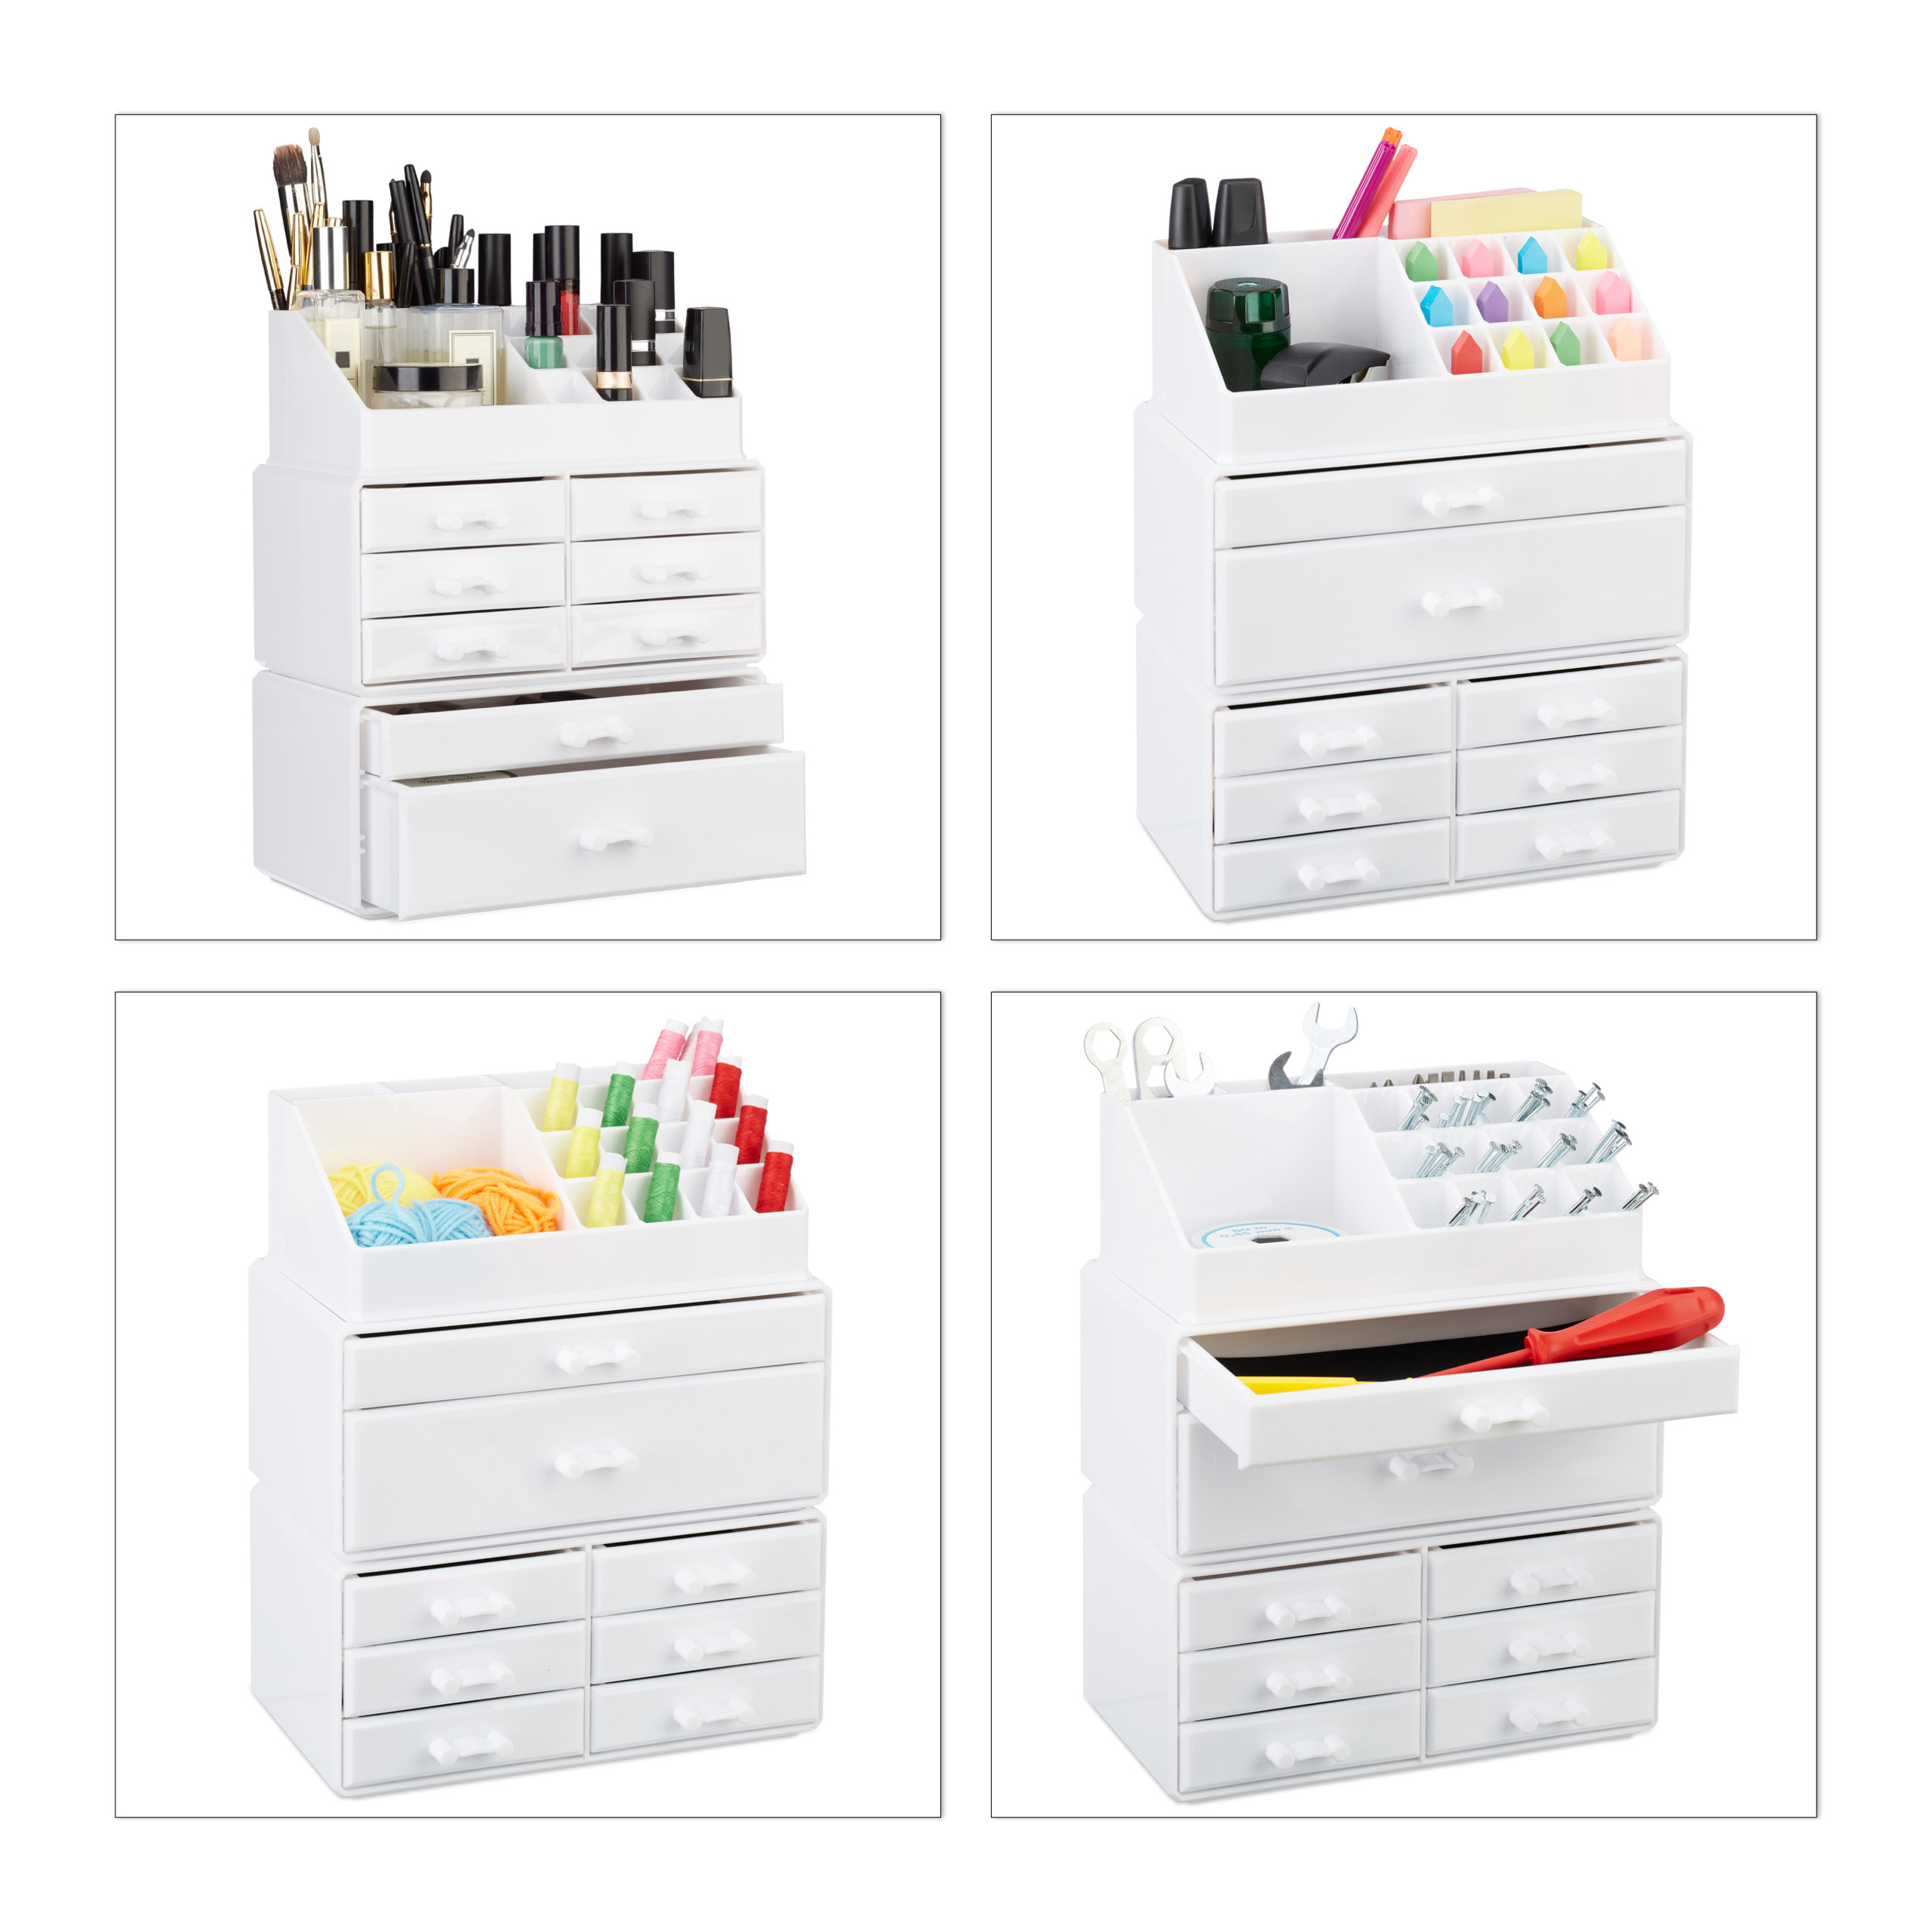 make-up-organizer-opbergen-van-cosmetica-acryl-stapelbaar-met-lades miniatuur 4